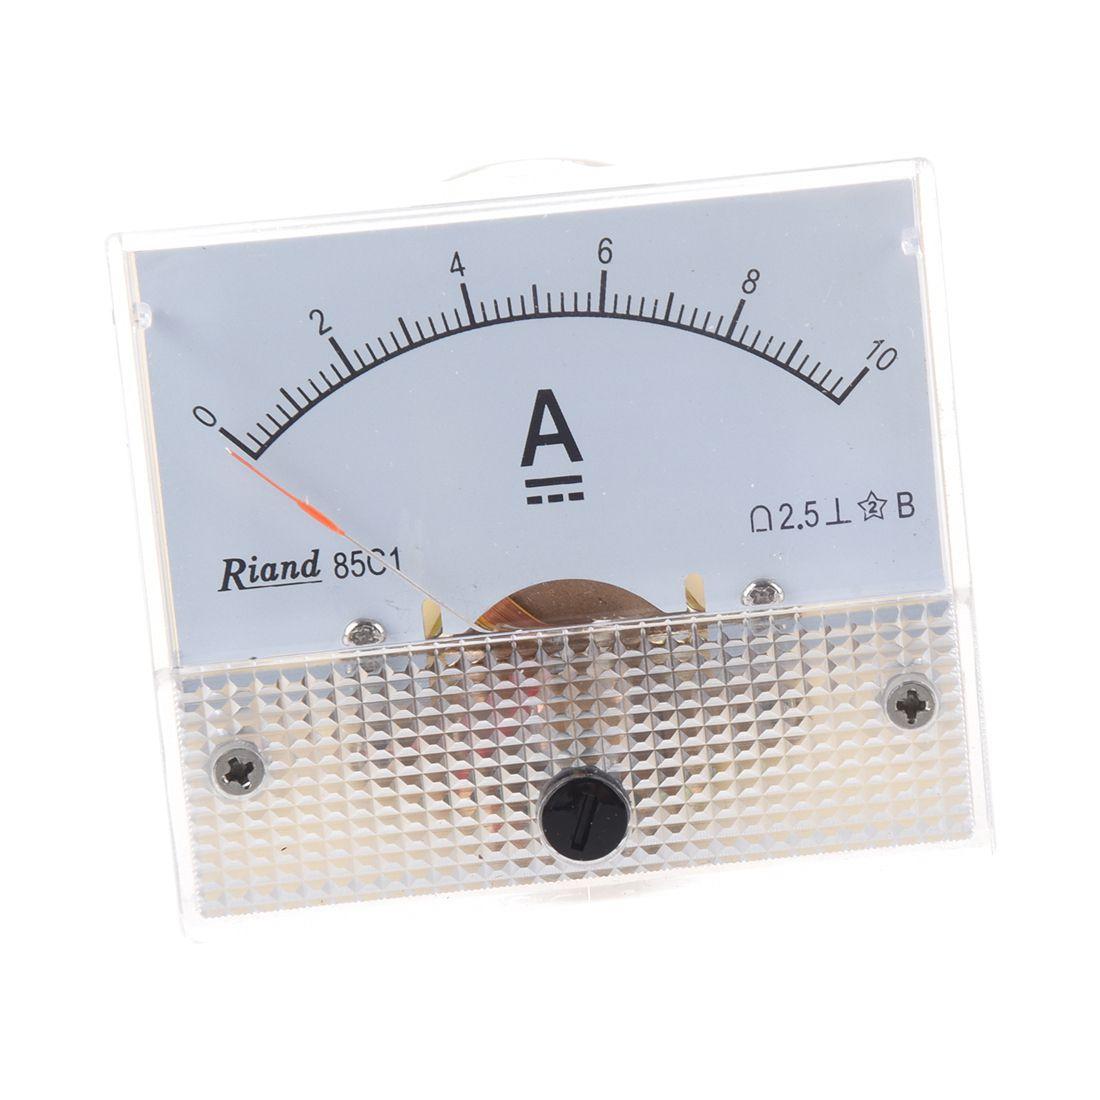 85C1 DC 0-10A Rectangle Analog Panel Ammeter Gauge